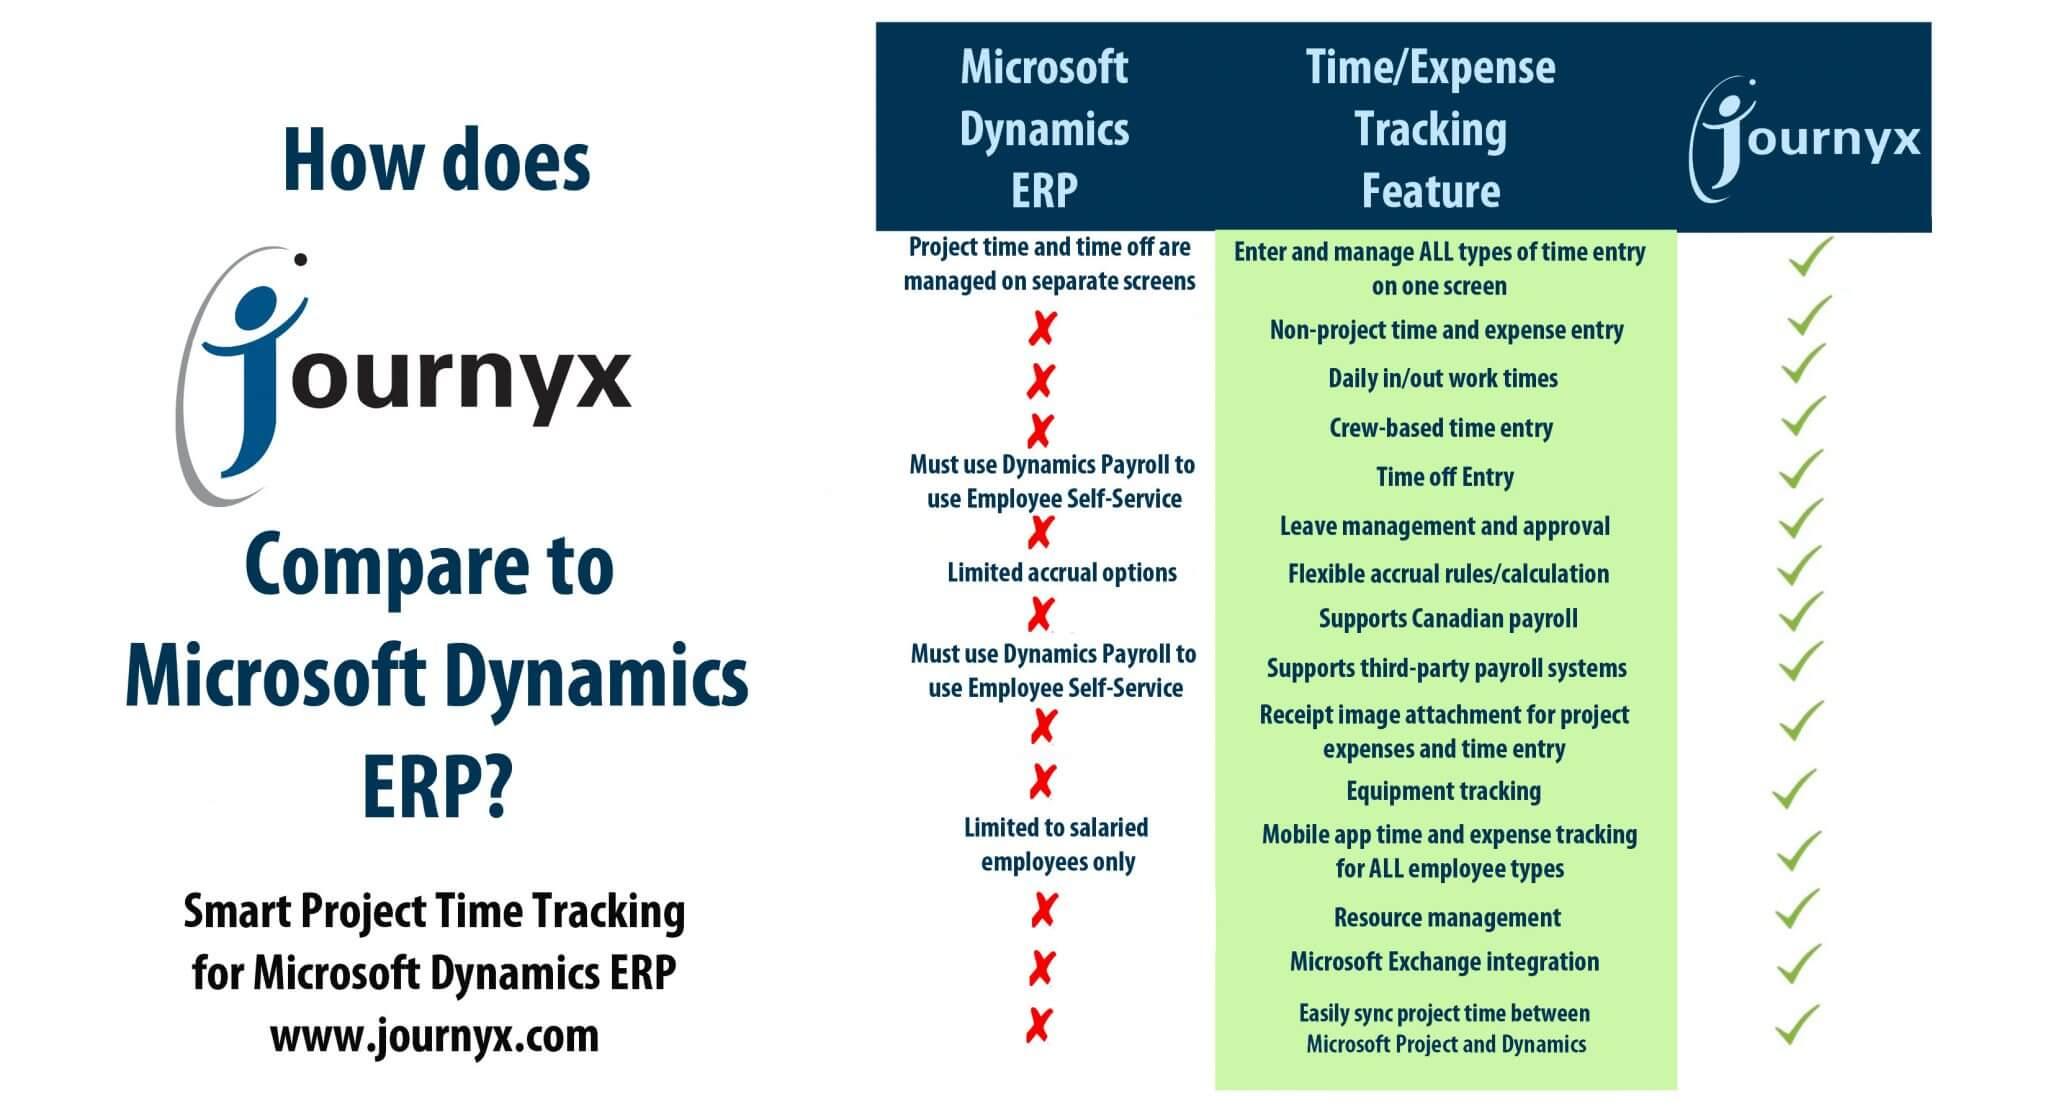 journyx comparison chart